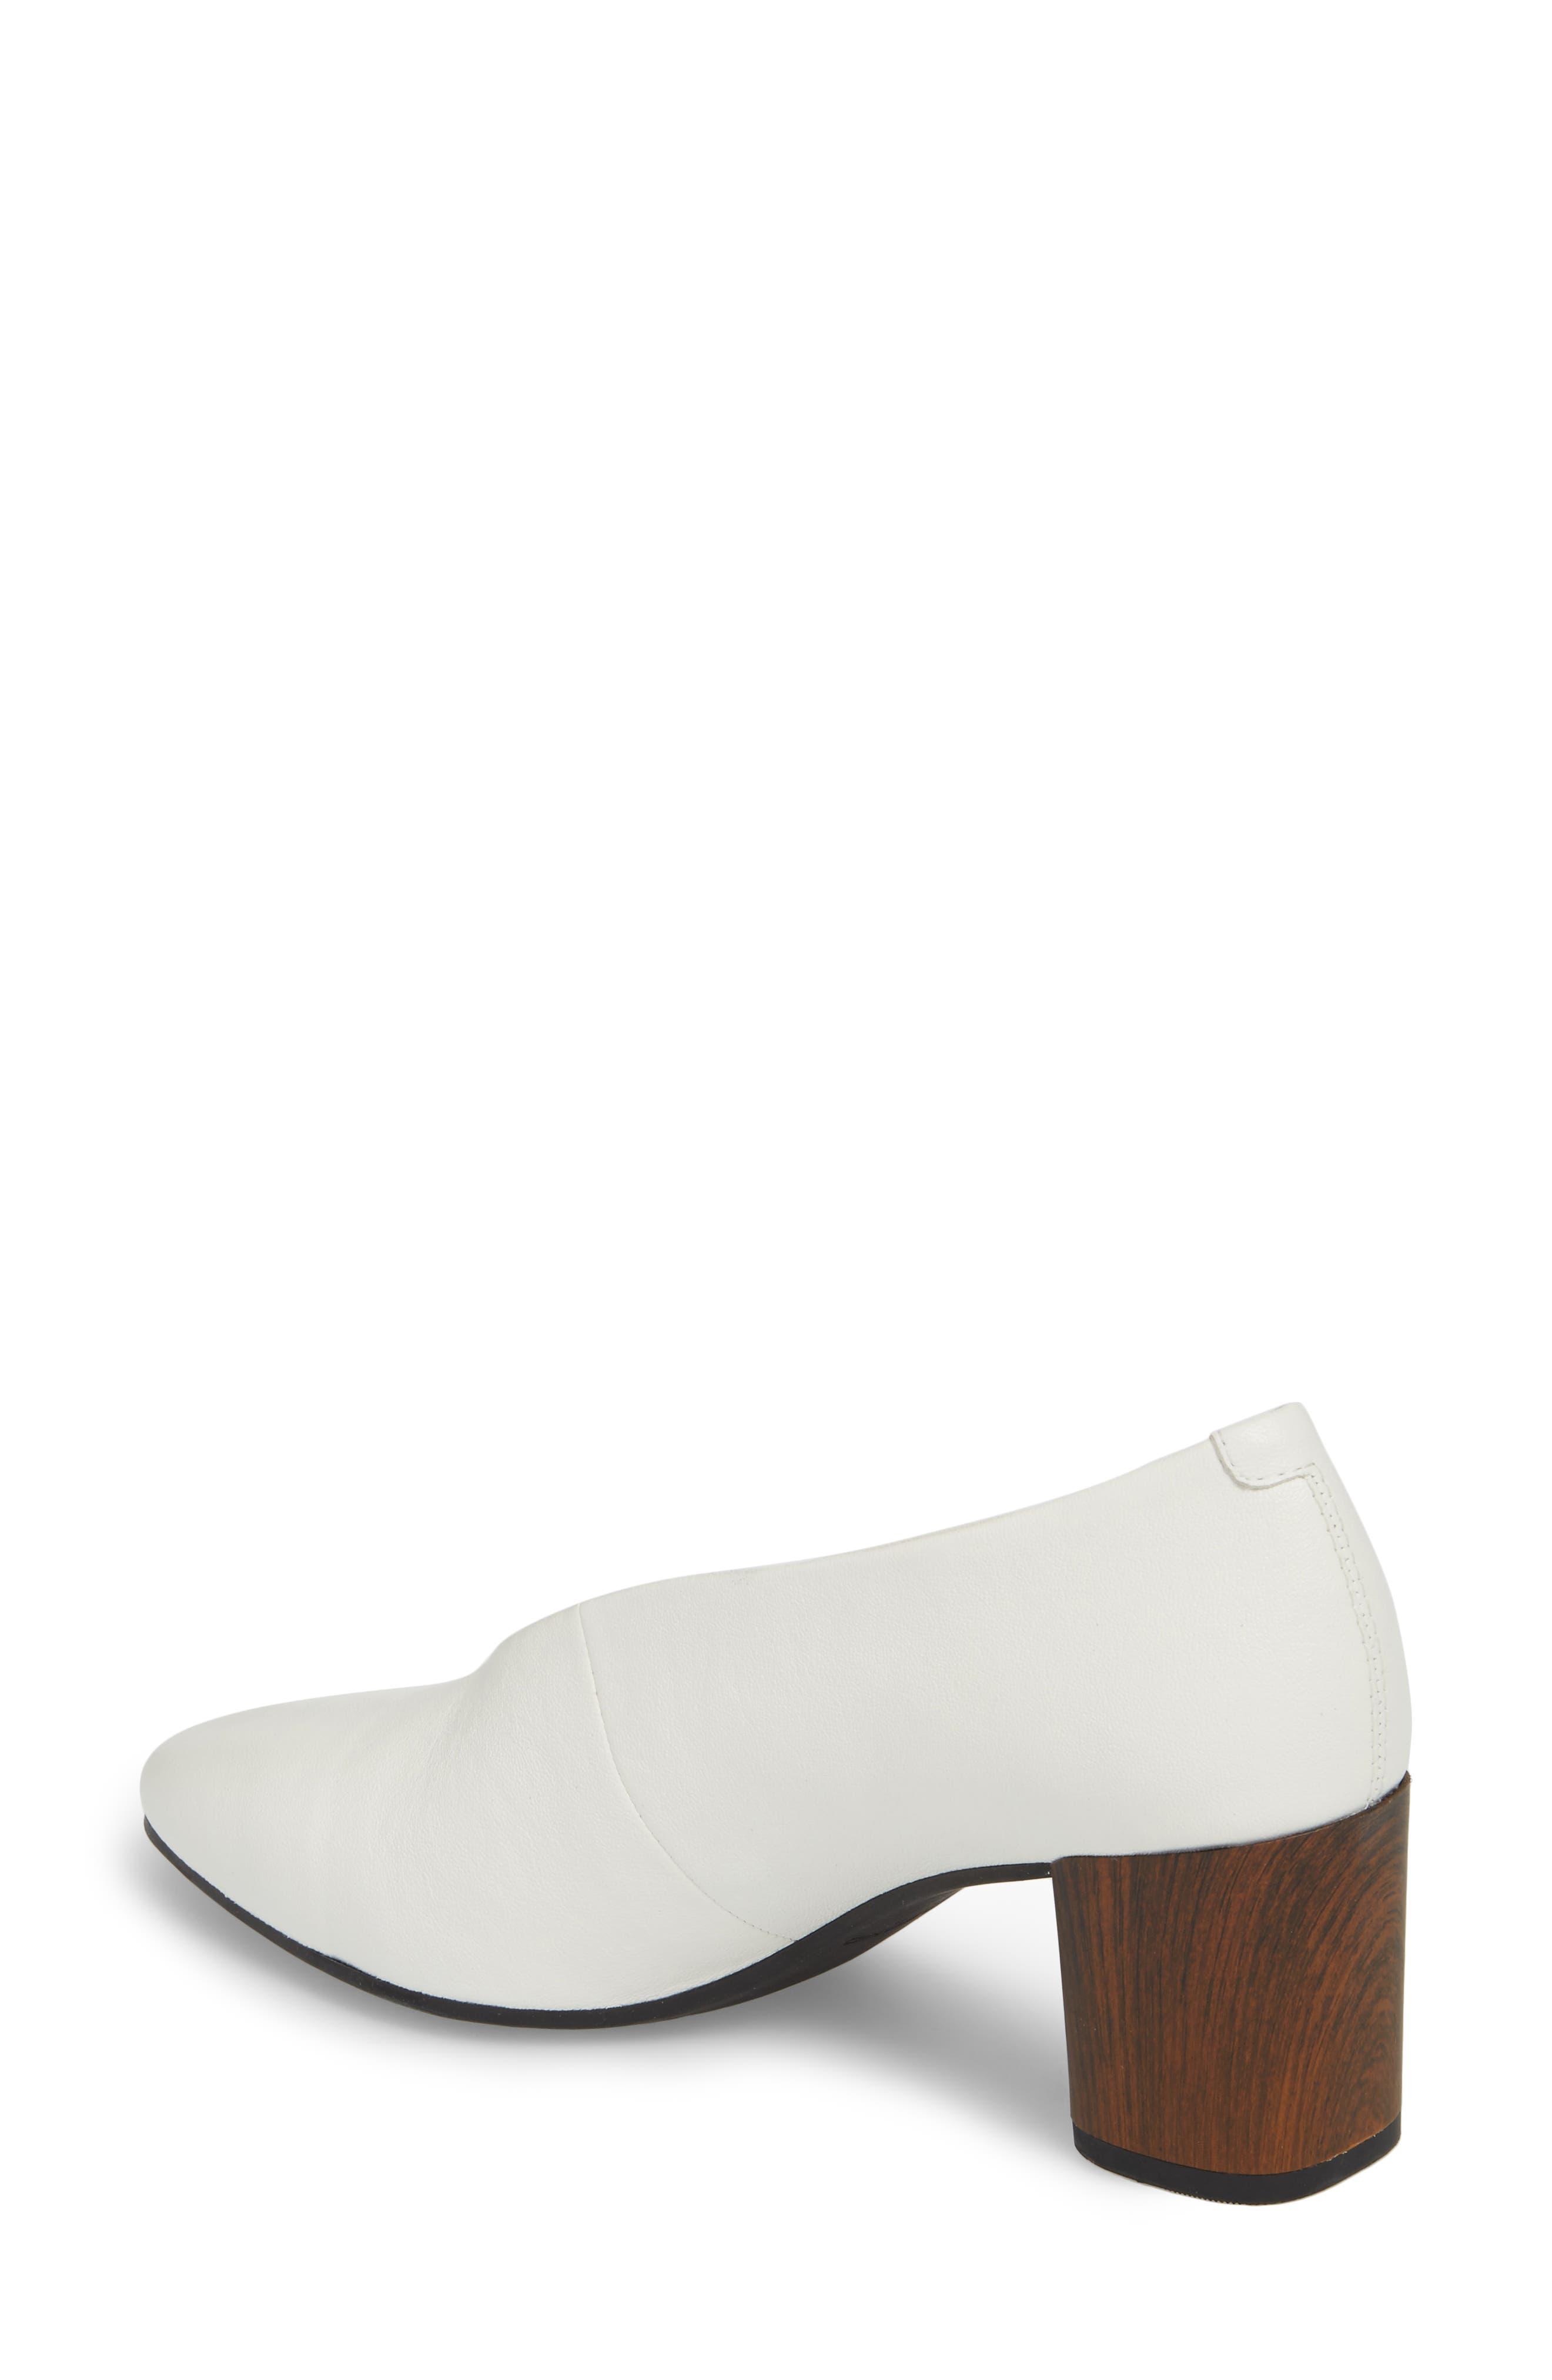 Eve Pump,                             Alternate thumbnail 2, color,                             Cream White Leather